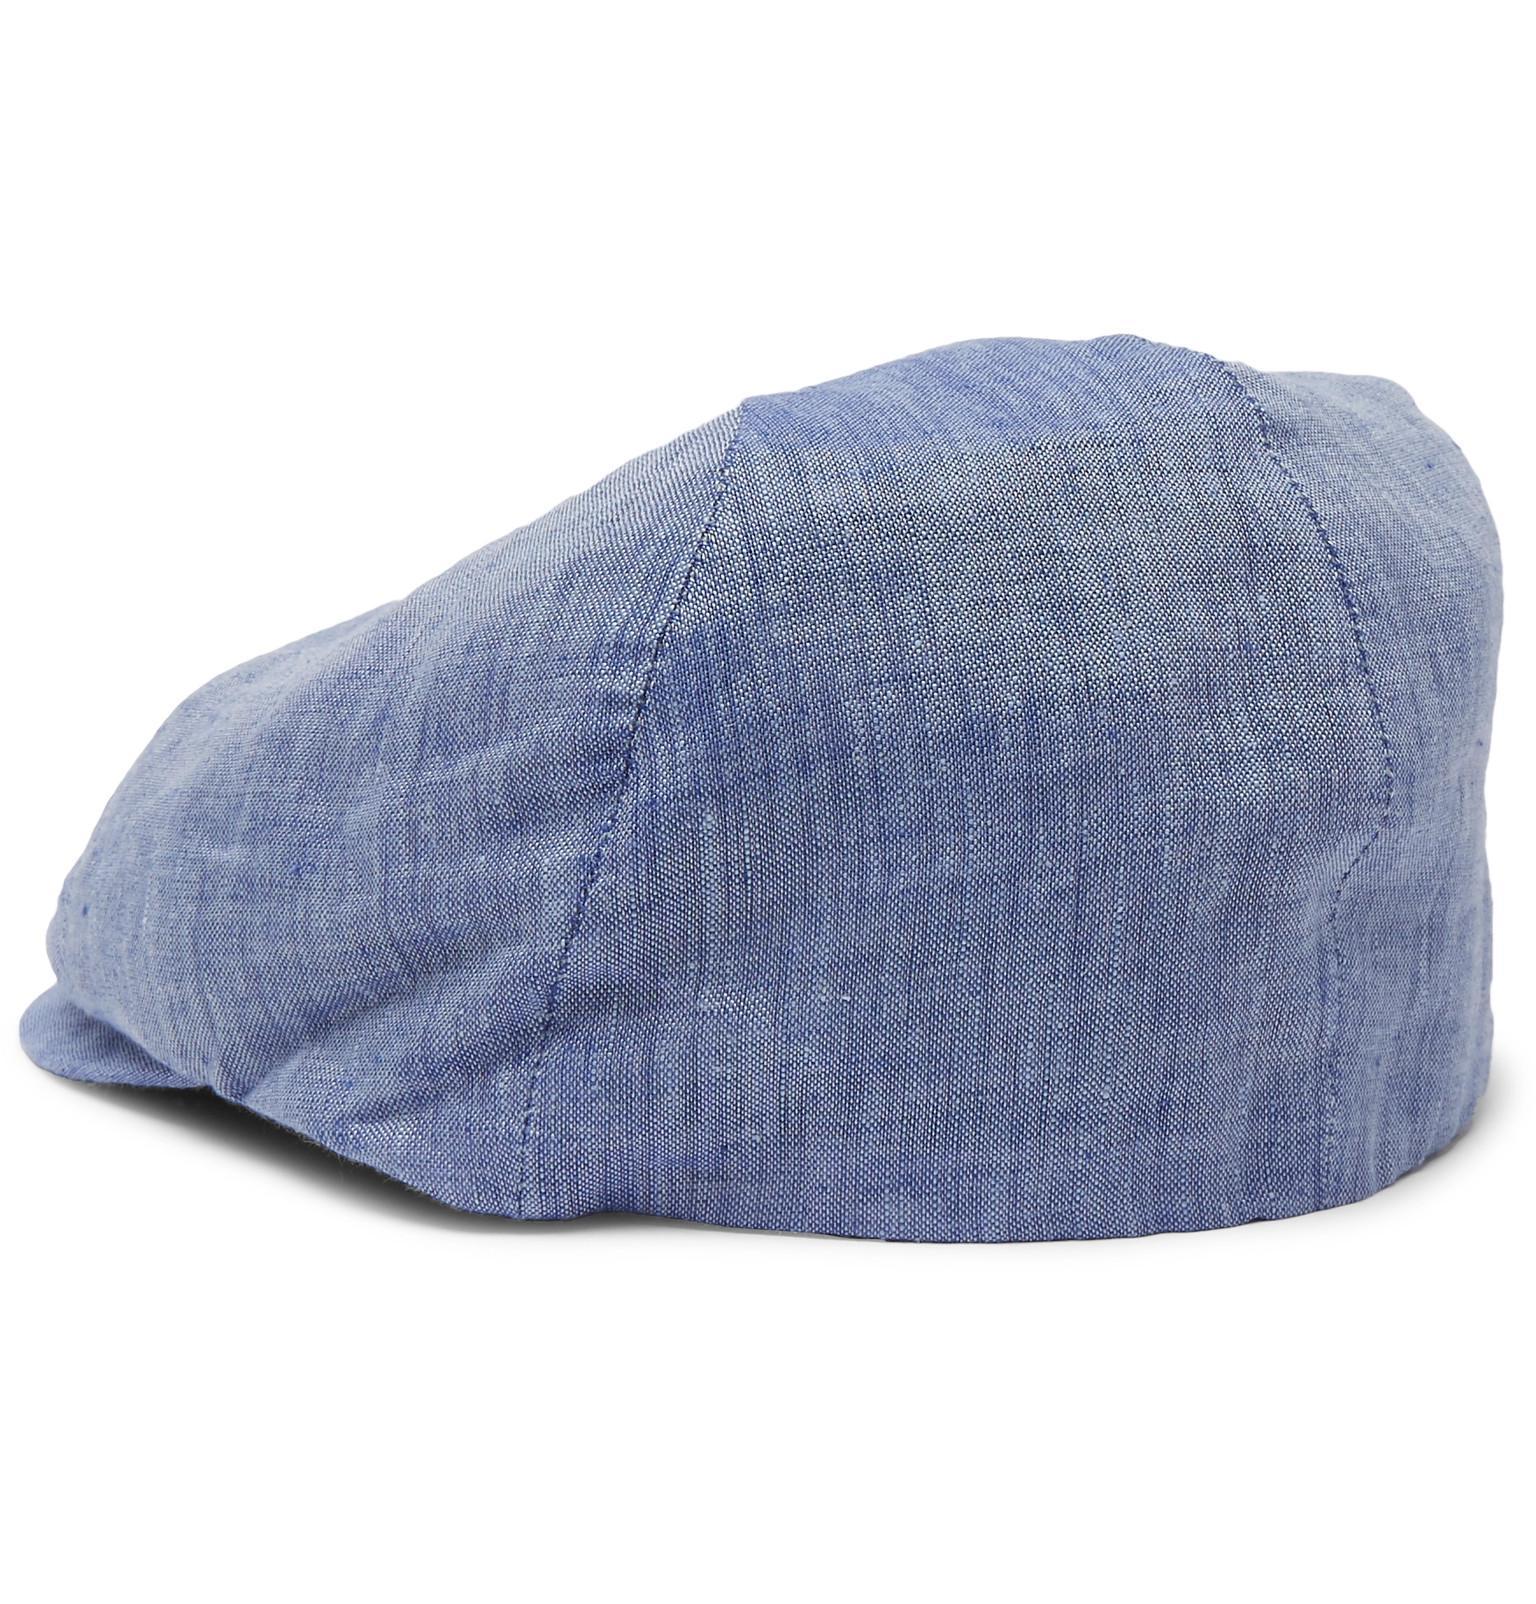 ad33b1da94c59d Lock & Co. Reverb Linen-chambray Flat Cap in Blue for Men - Lyst